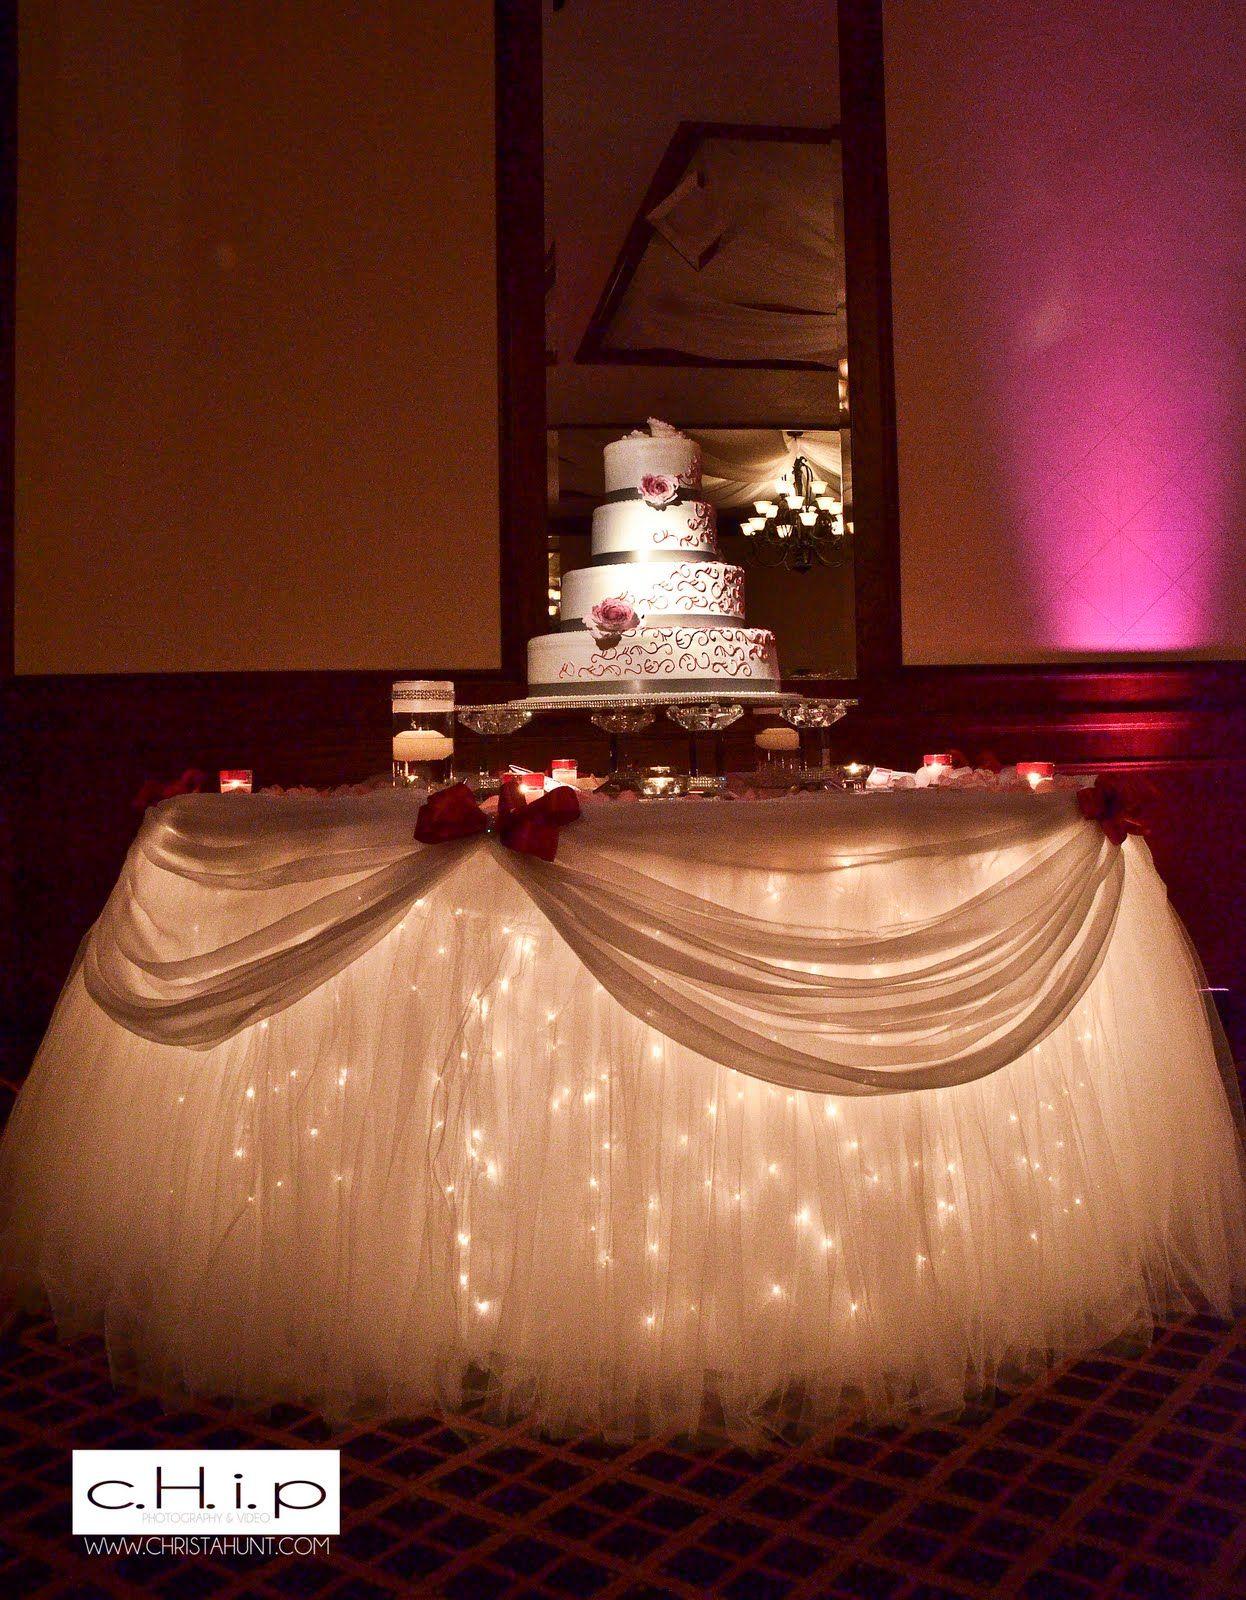 Wedding Cake Table Google Search Wedding Cake Table Wedding Decorations Cake Table Decorations